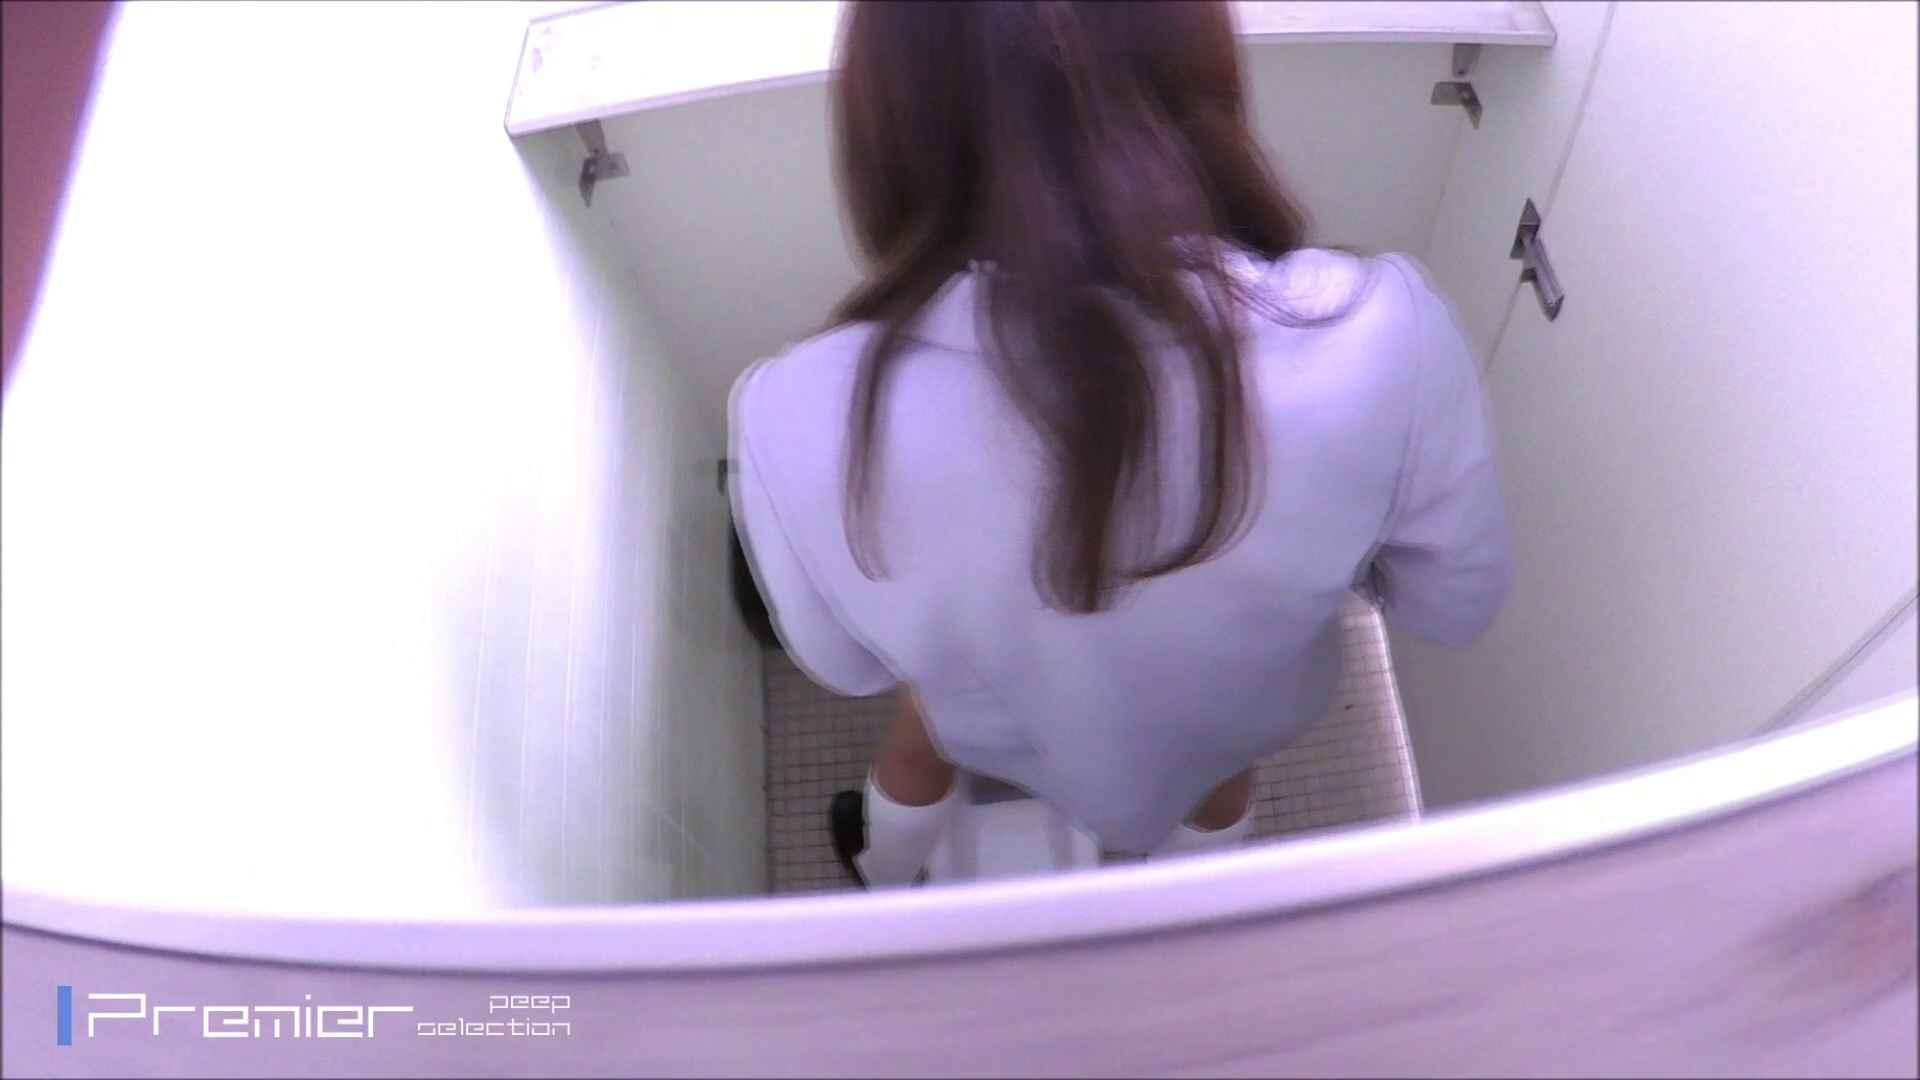 FHD激カワ!激やば! 復讐のトイレ盗撮 Vol.03 盛合せ 戯れ無修正画像 51画像 4